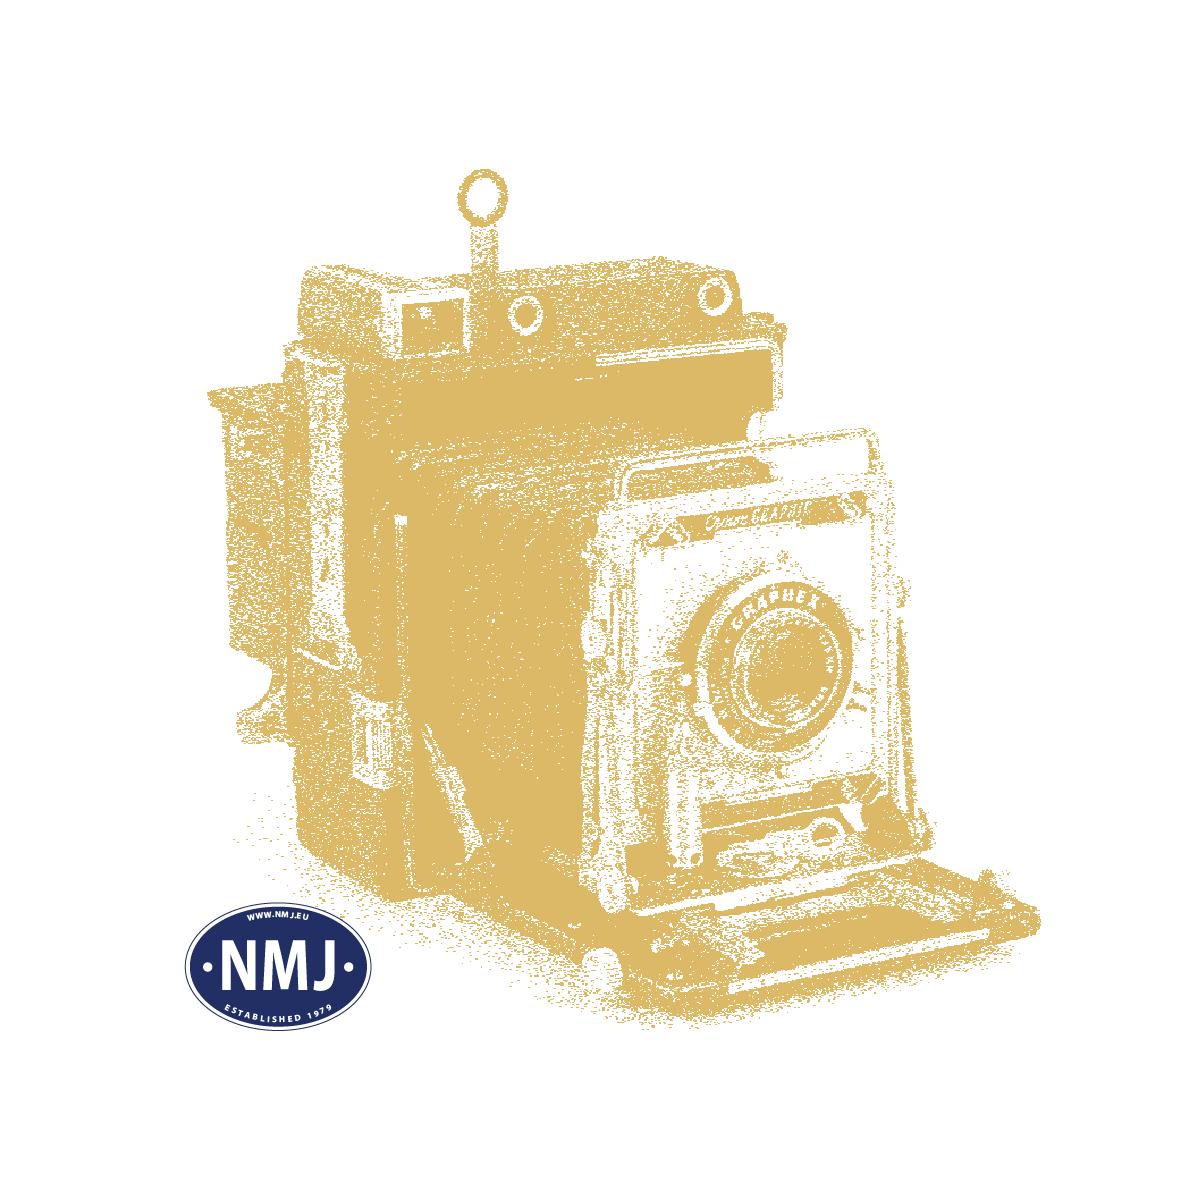 "NMJT90004 - NMJ Topline NSB Di3a.621 ""Nohab"", Nydesign, DC"